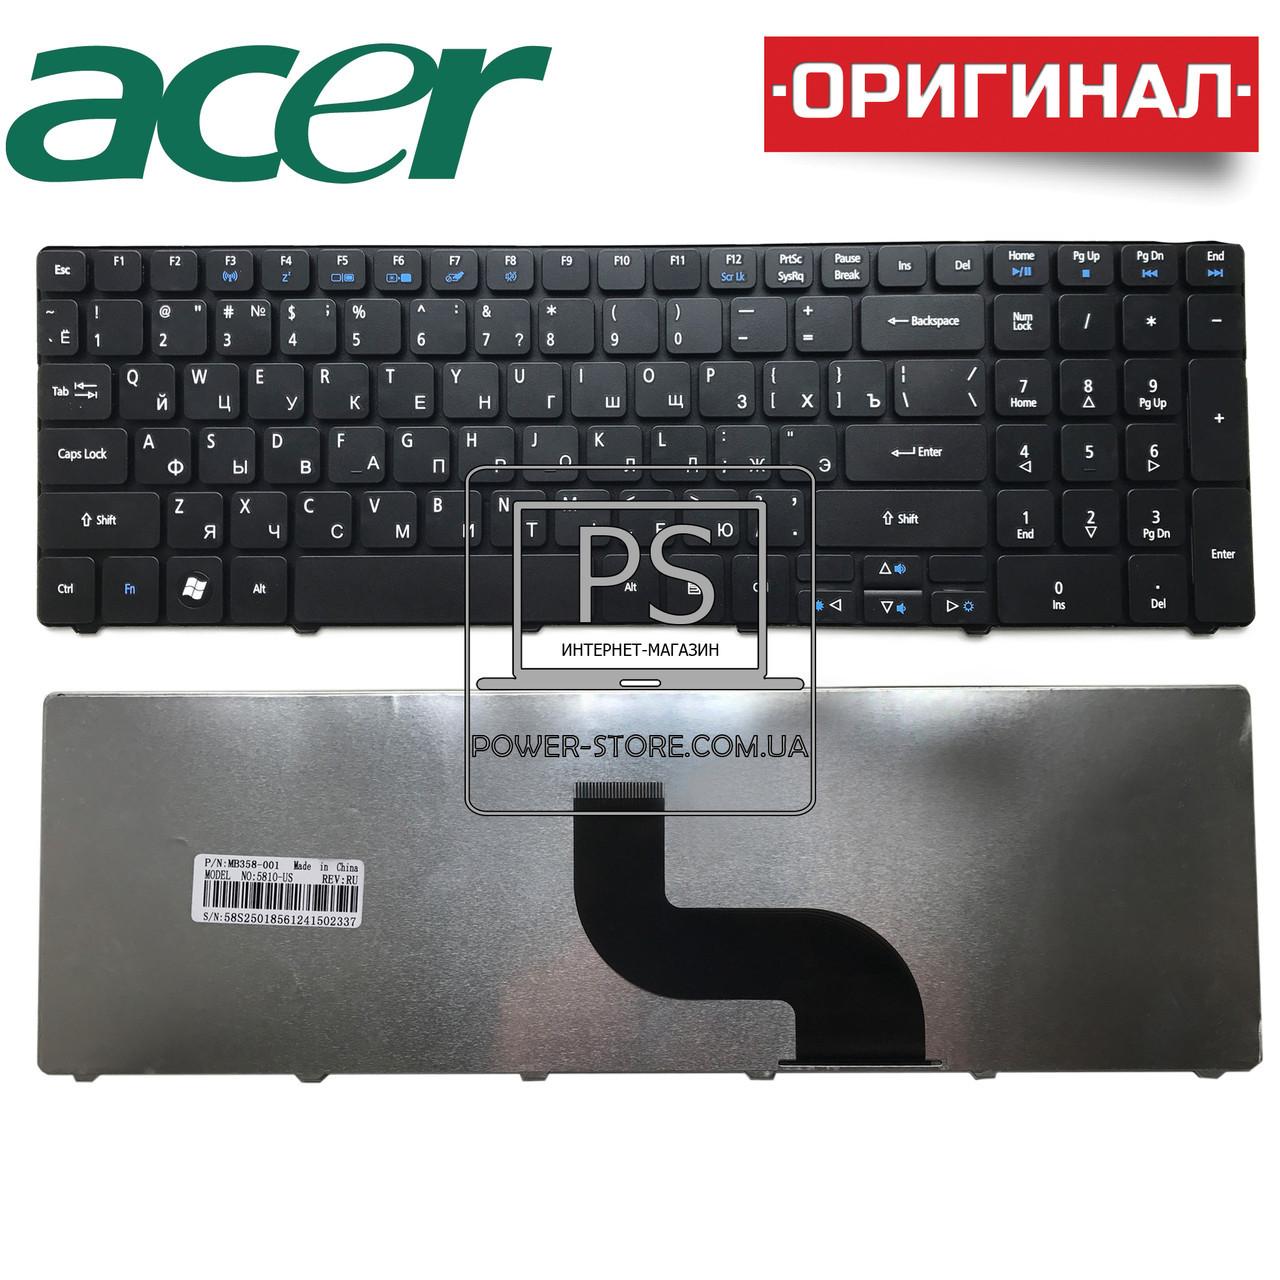 Клавиатура  для ноутбука ACER  KB.I170A.153, KB.I170A.154, KB.I170A.155, KB.I170A.156,